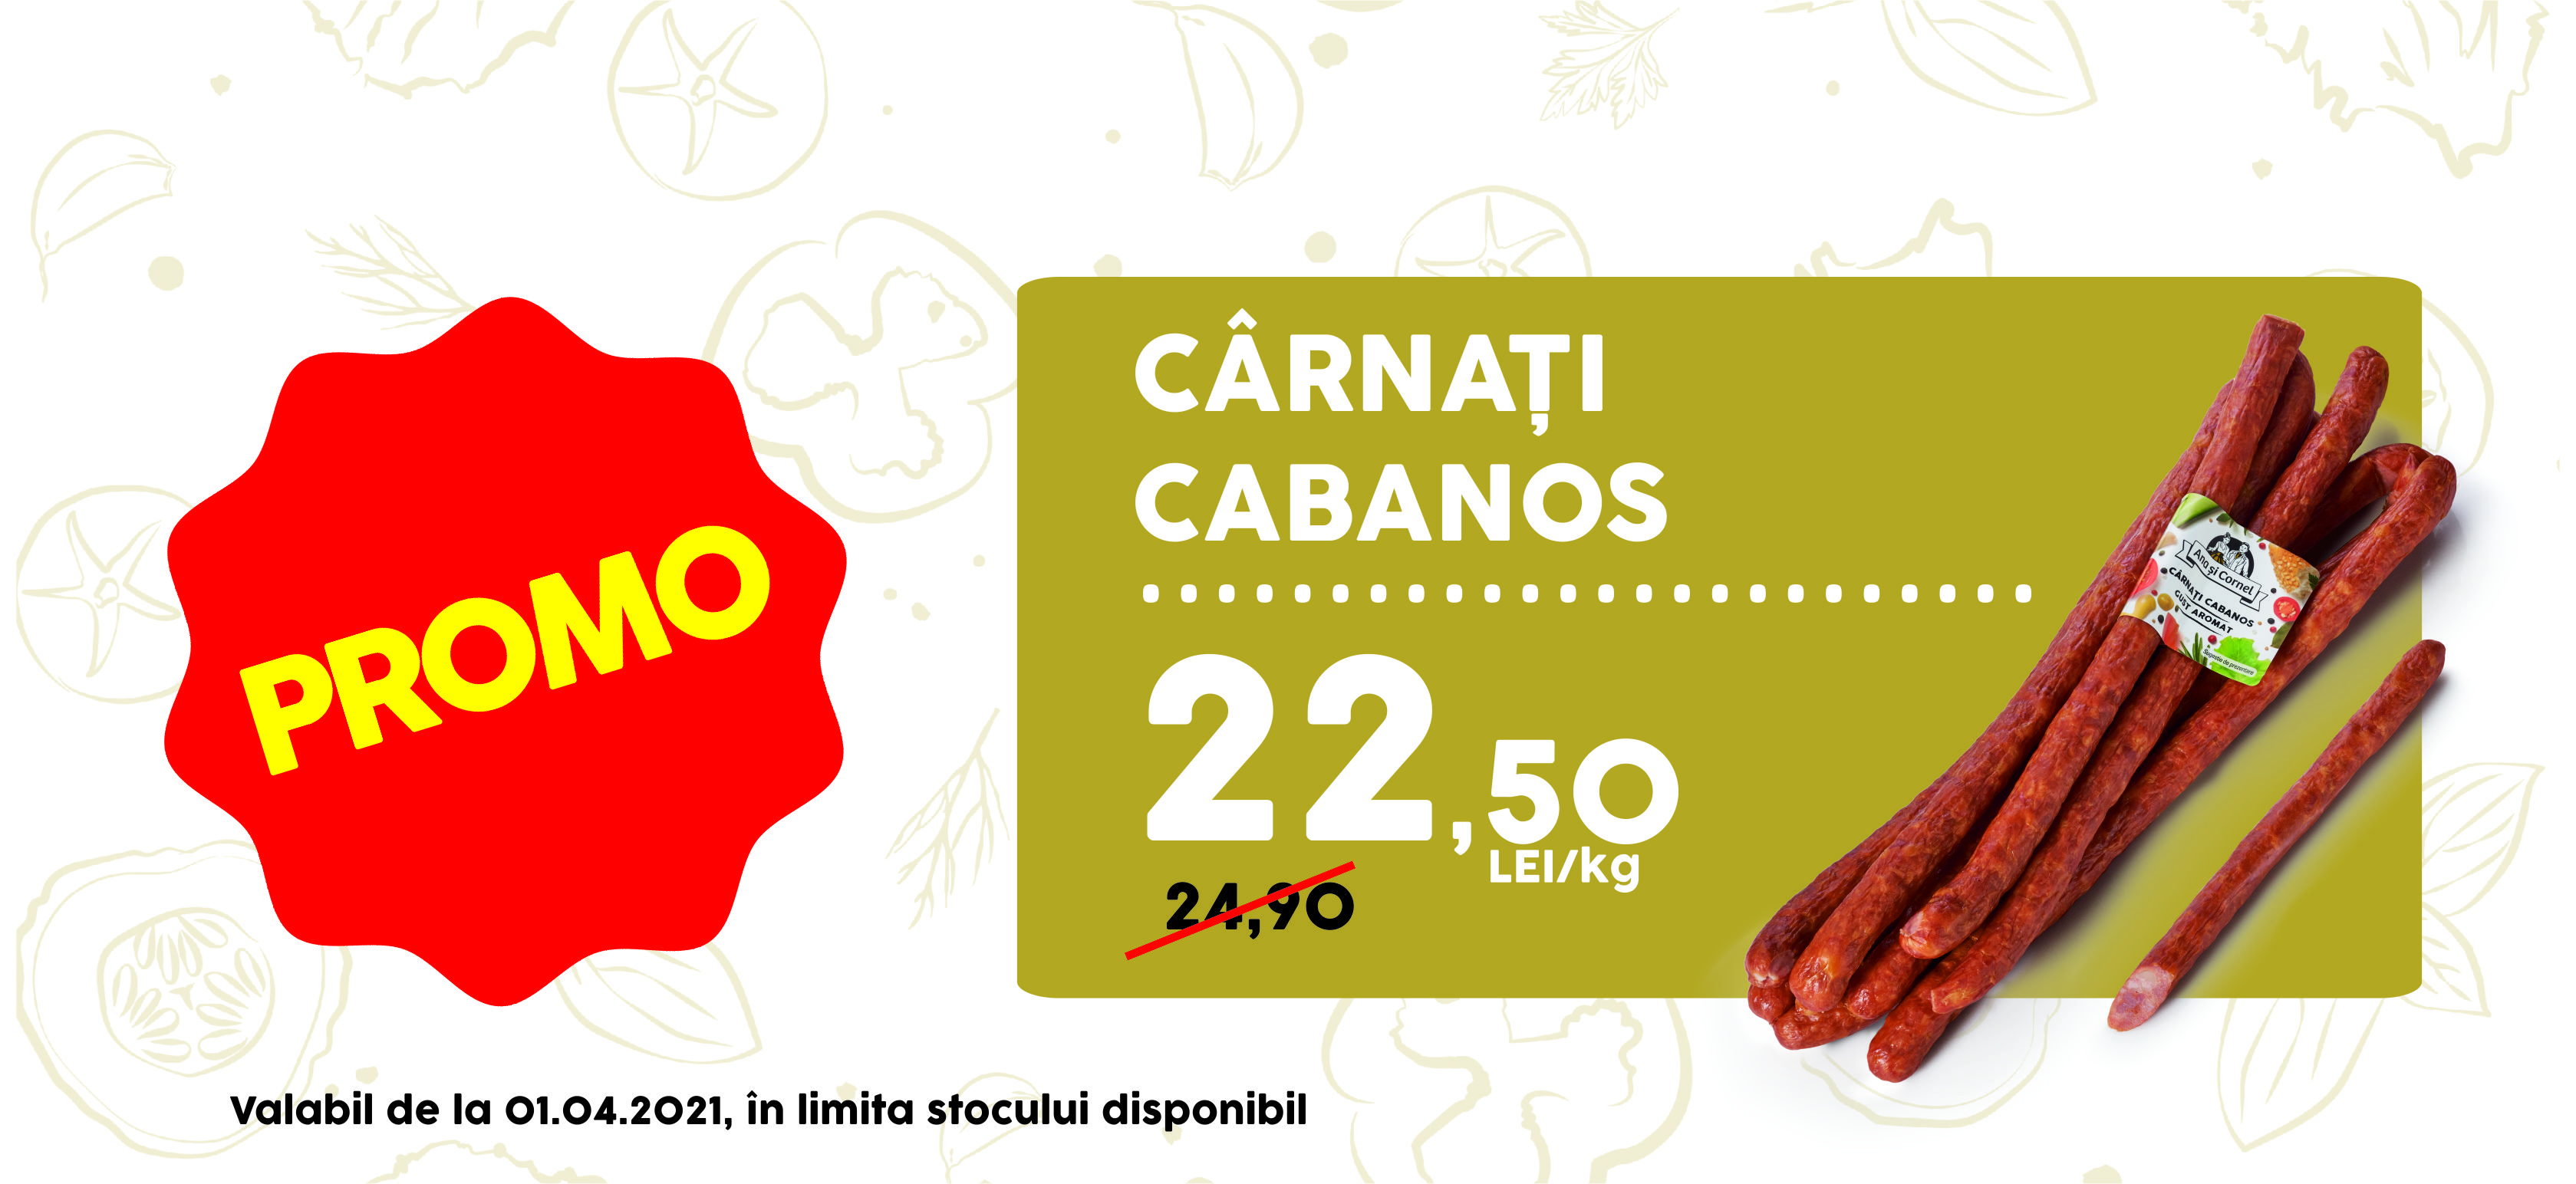 CARNATI-CABANOS